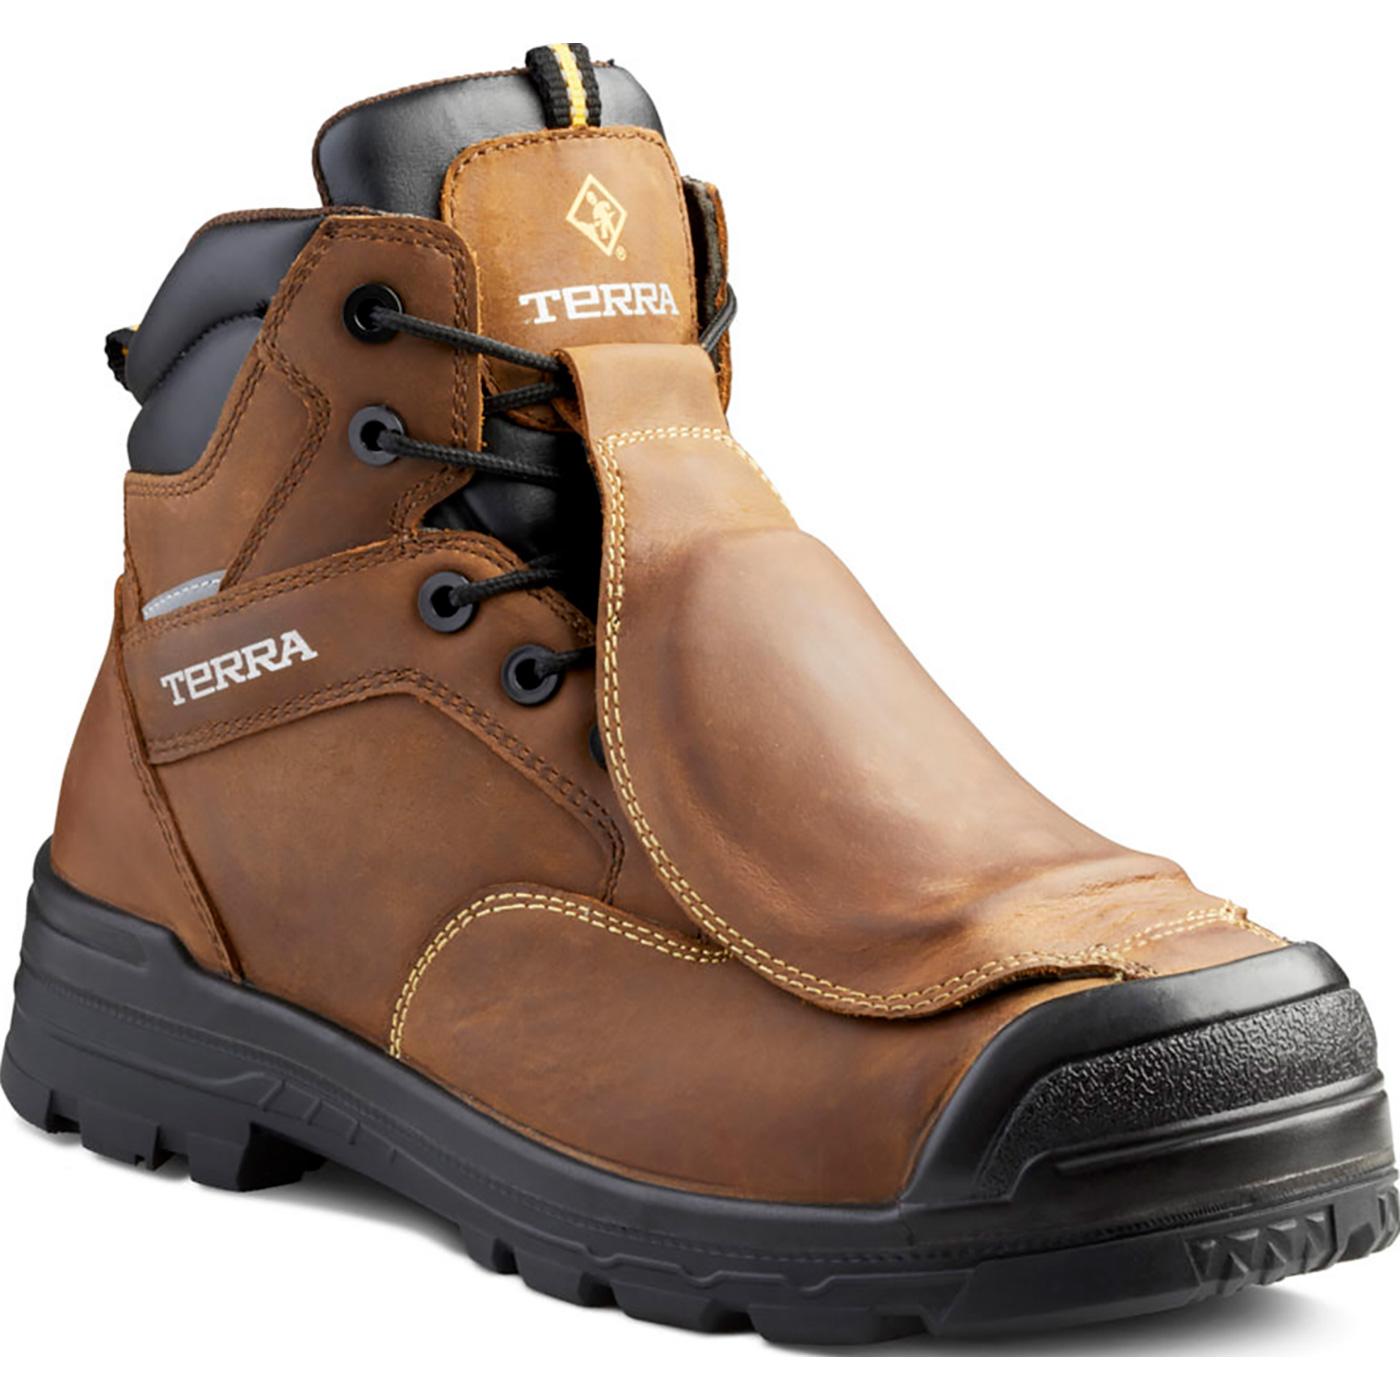 52c3efbaa93 Terra Barricade Men's 6 inch CSA-Approved Met Guard Composite Toe  Puncture-Resistant Waterproof Insulated Work Boot